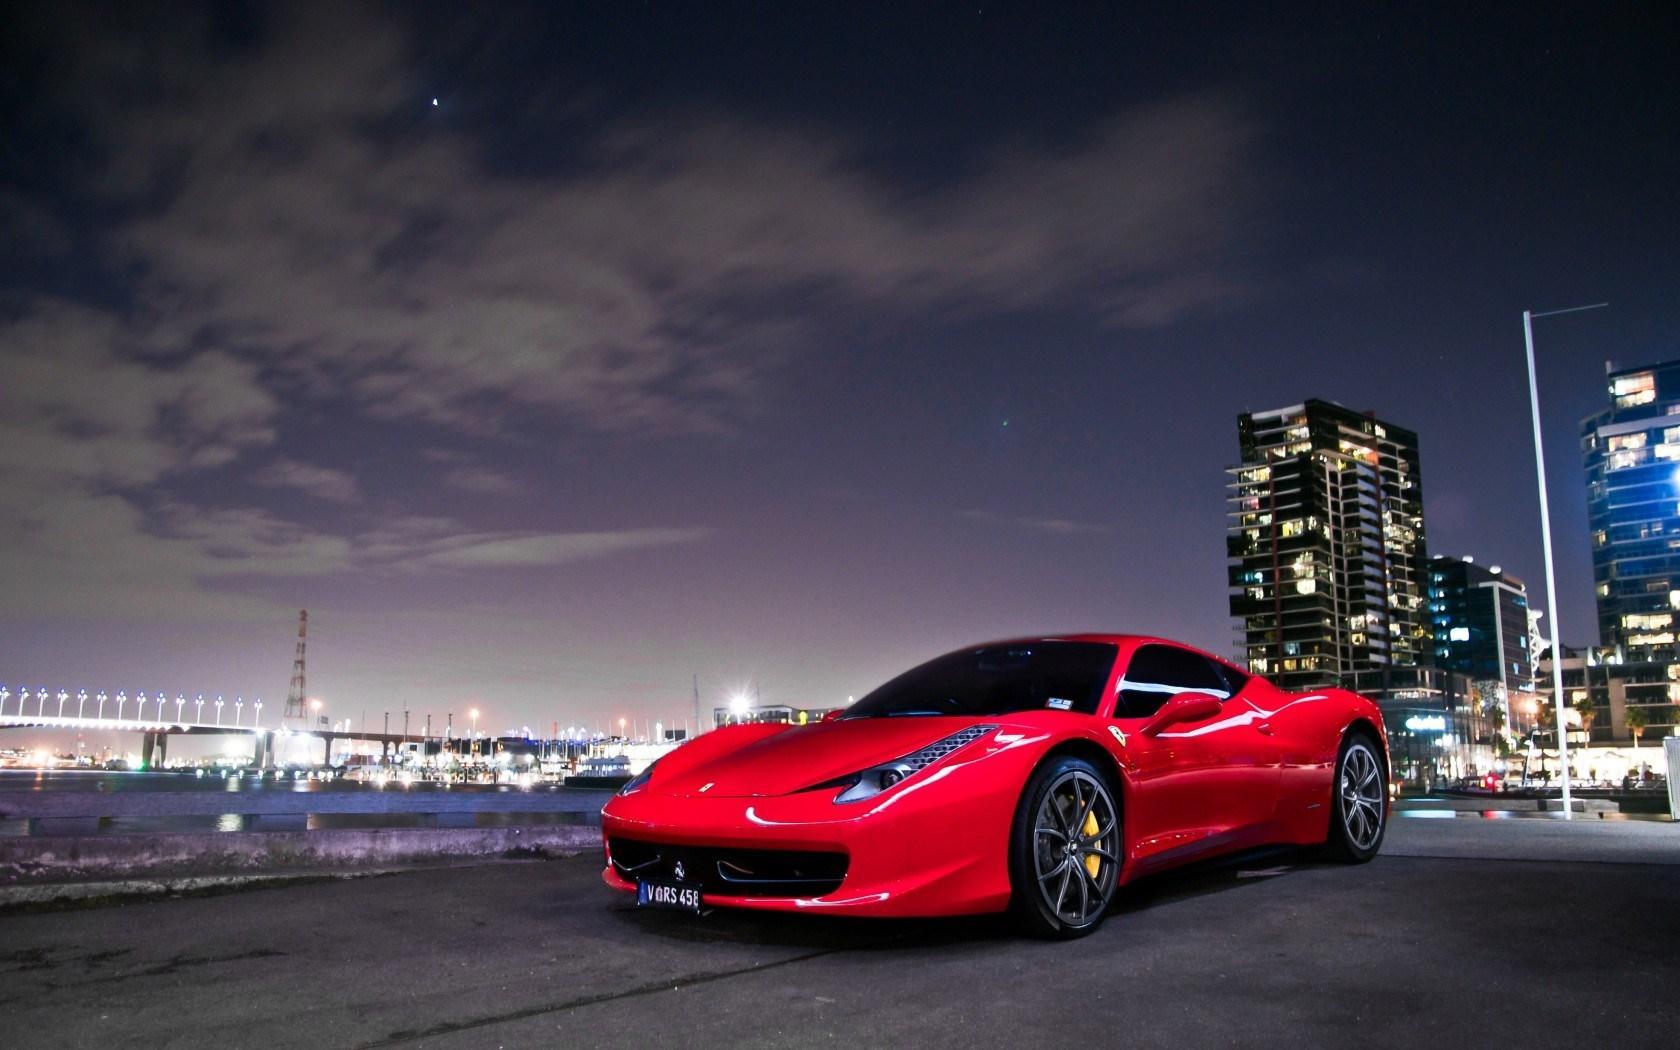 Full Hd Car Logos Wallpapers Ferrari 458 Italia Red Car Night Wallpaper Nature And